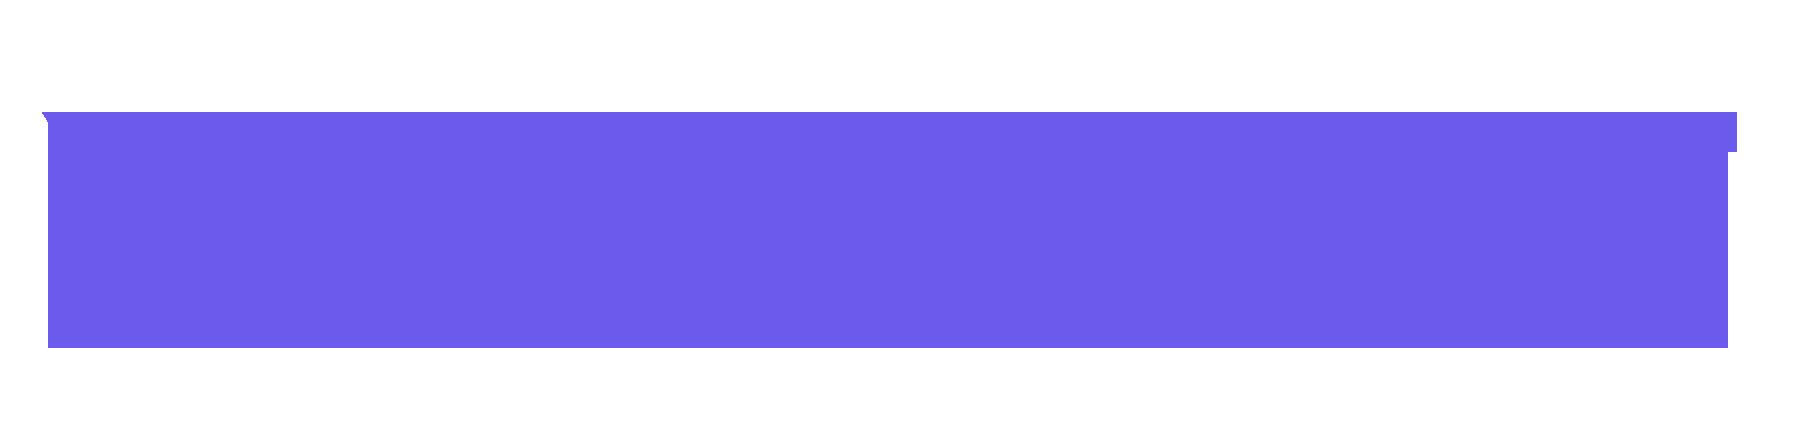 logo webcept purple